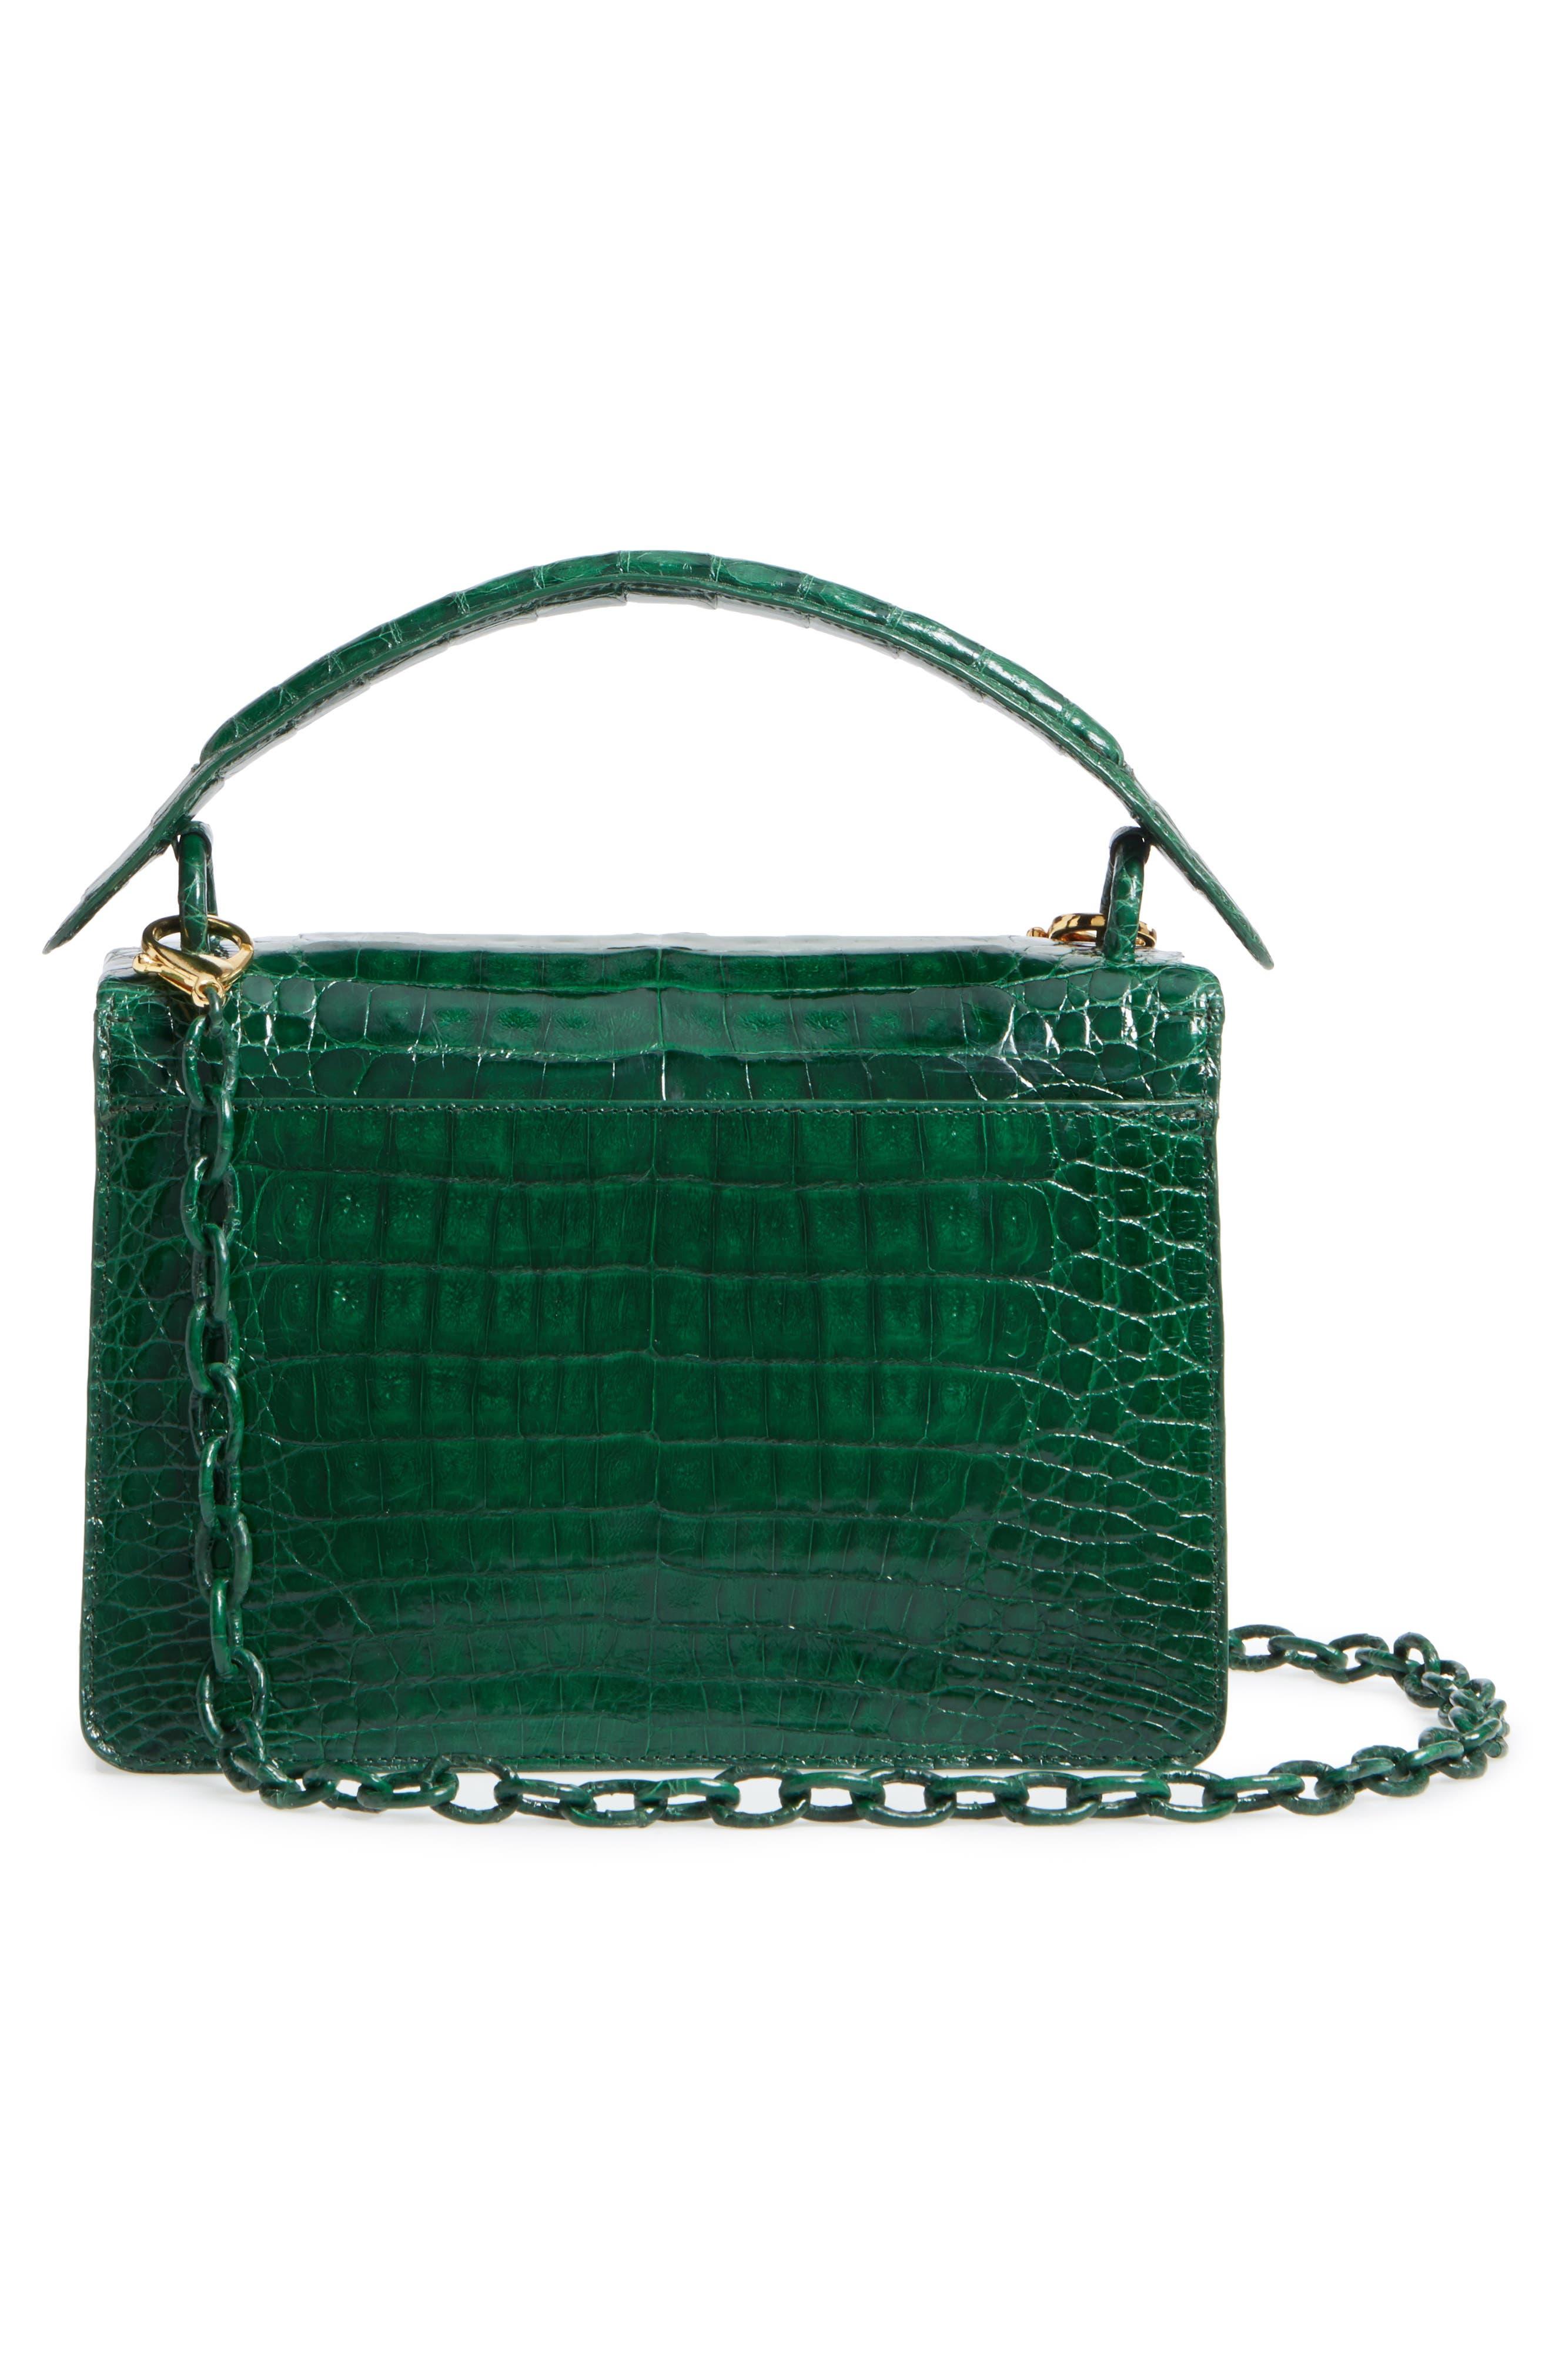 Divino Genuine Crocodile Top Handle Bag,                             Alternate thumbnail 3, color,                             KELLY GREEN SHINY